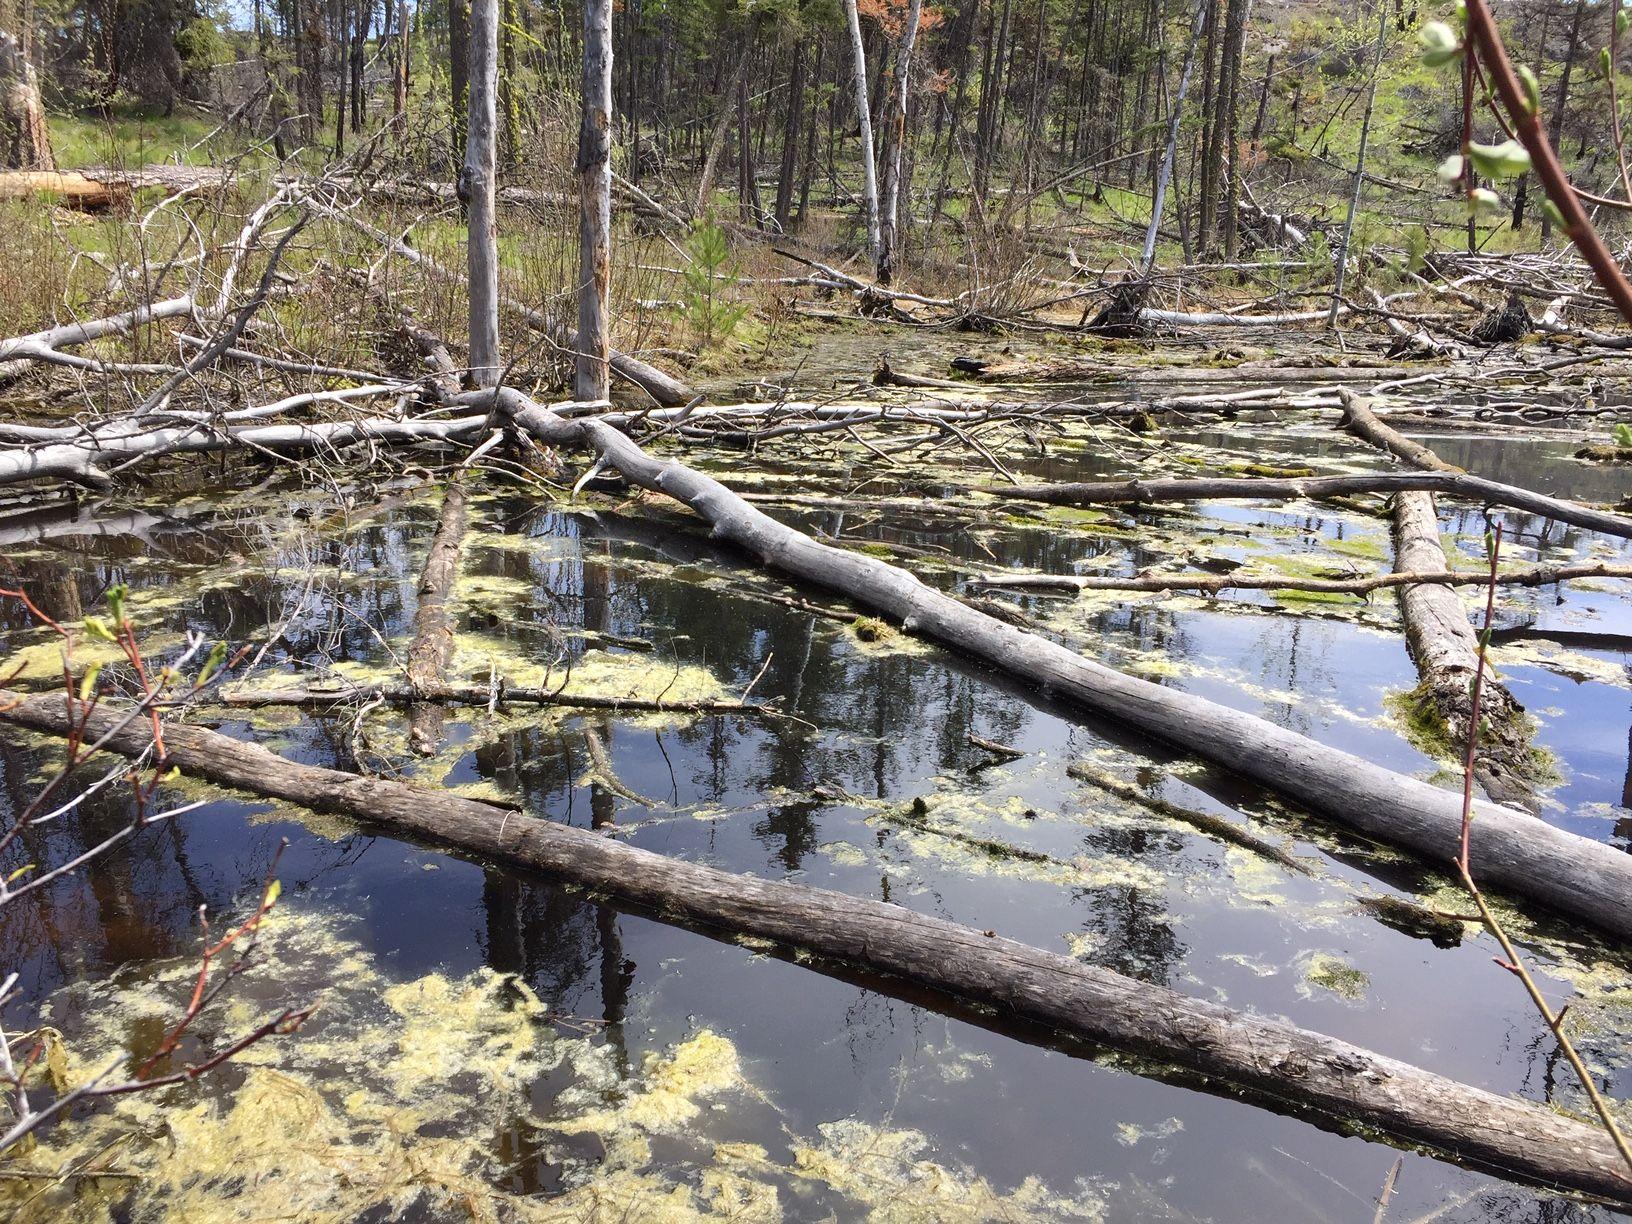 A swamp on McDougall Rim Trail, West Kelowna, British Columbia